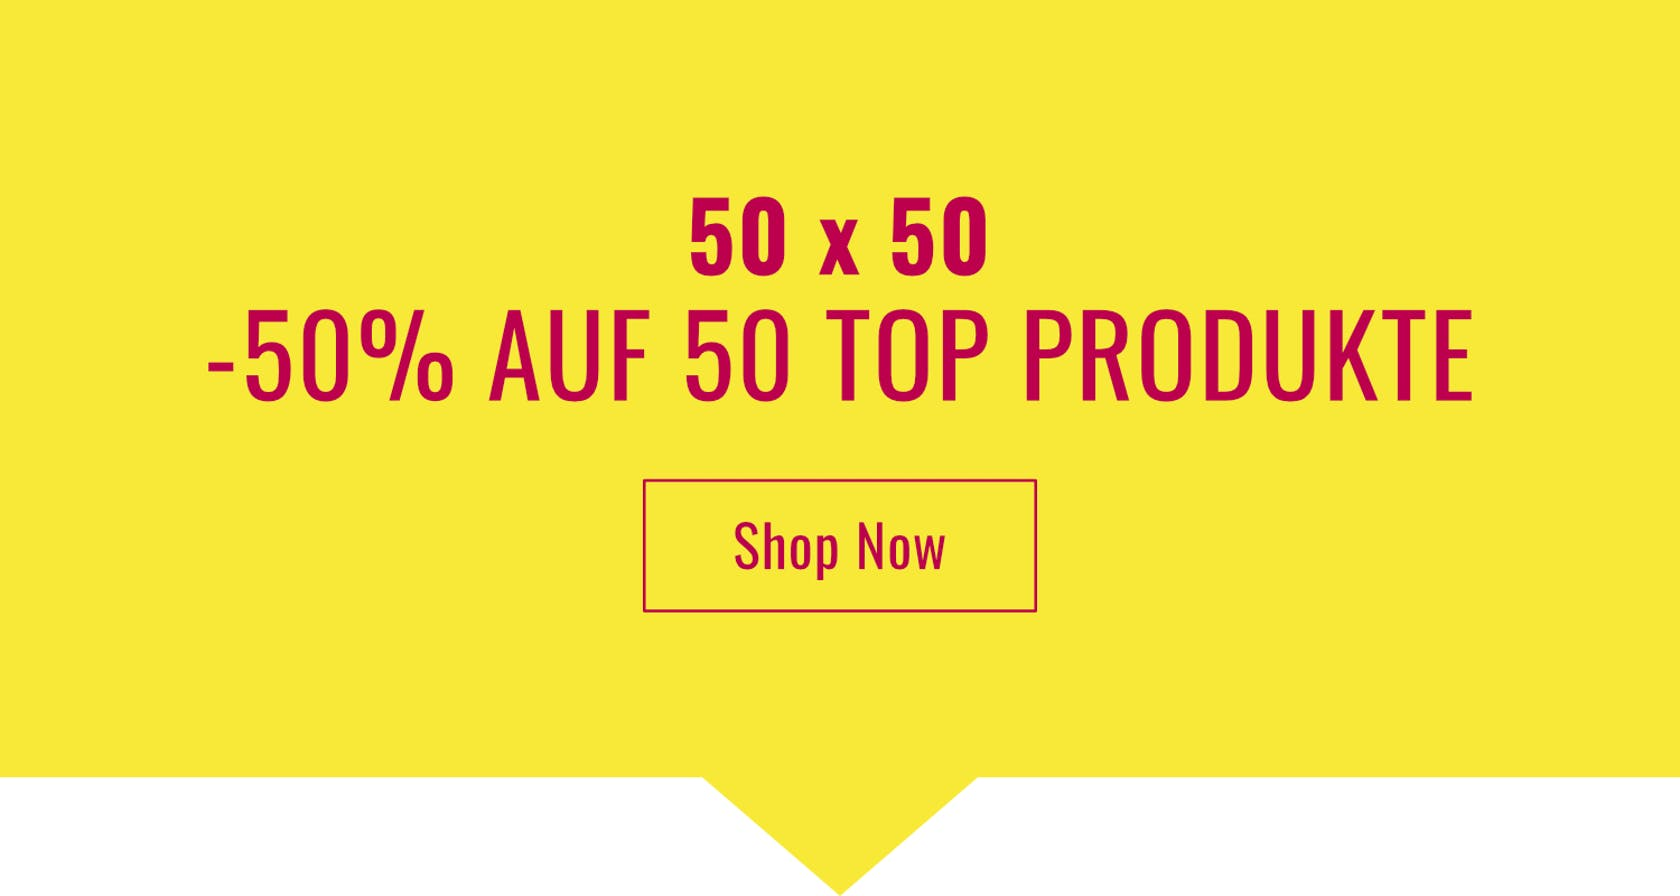 50x50 Angebote -50%